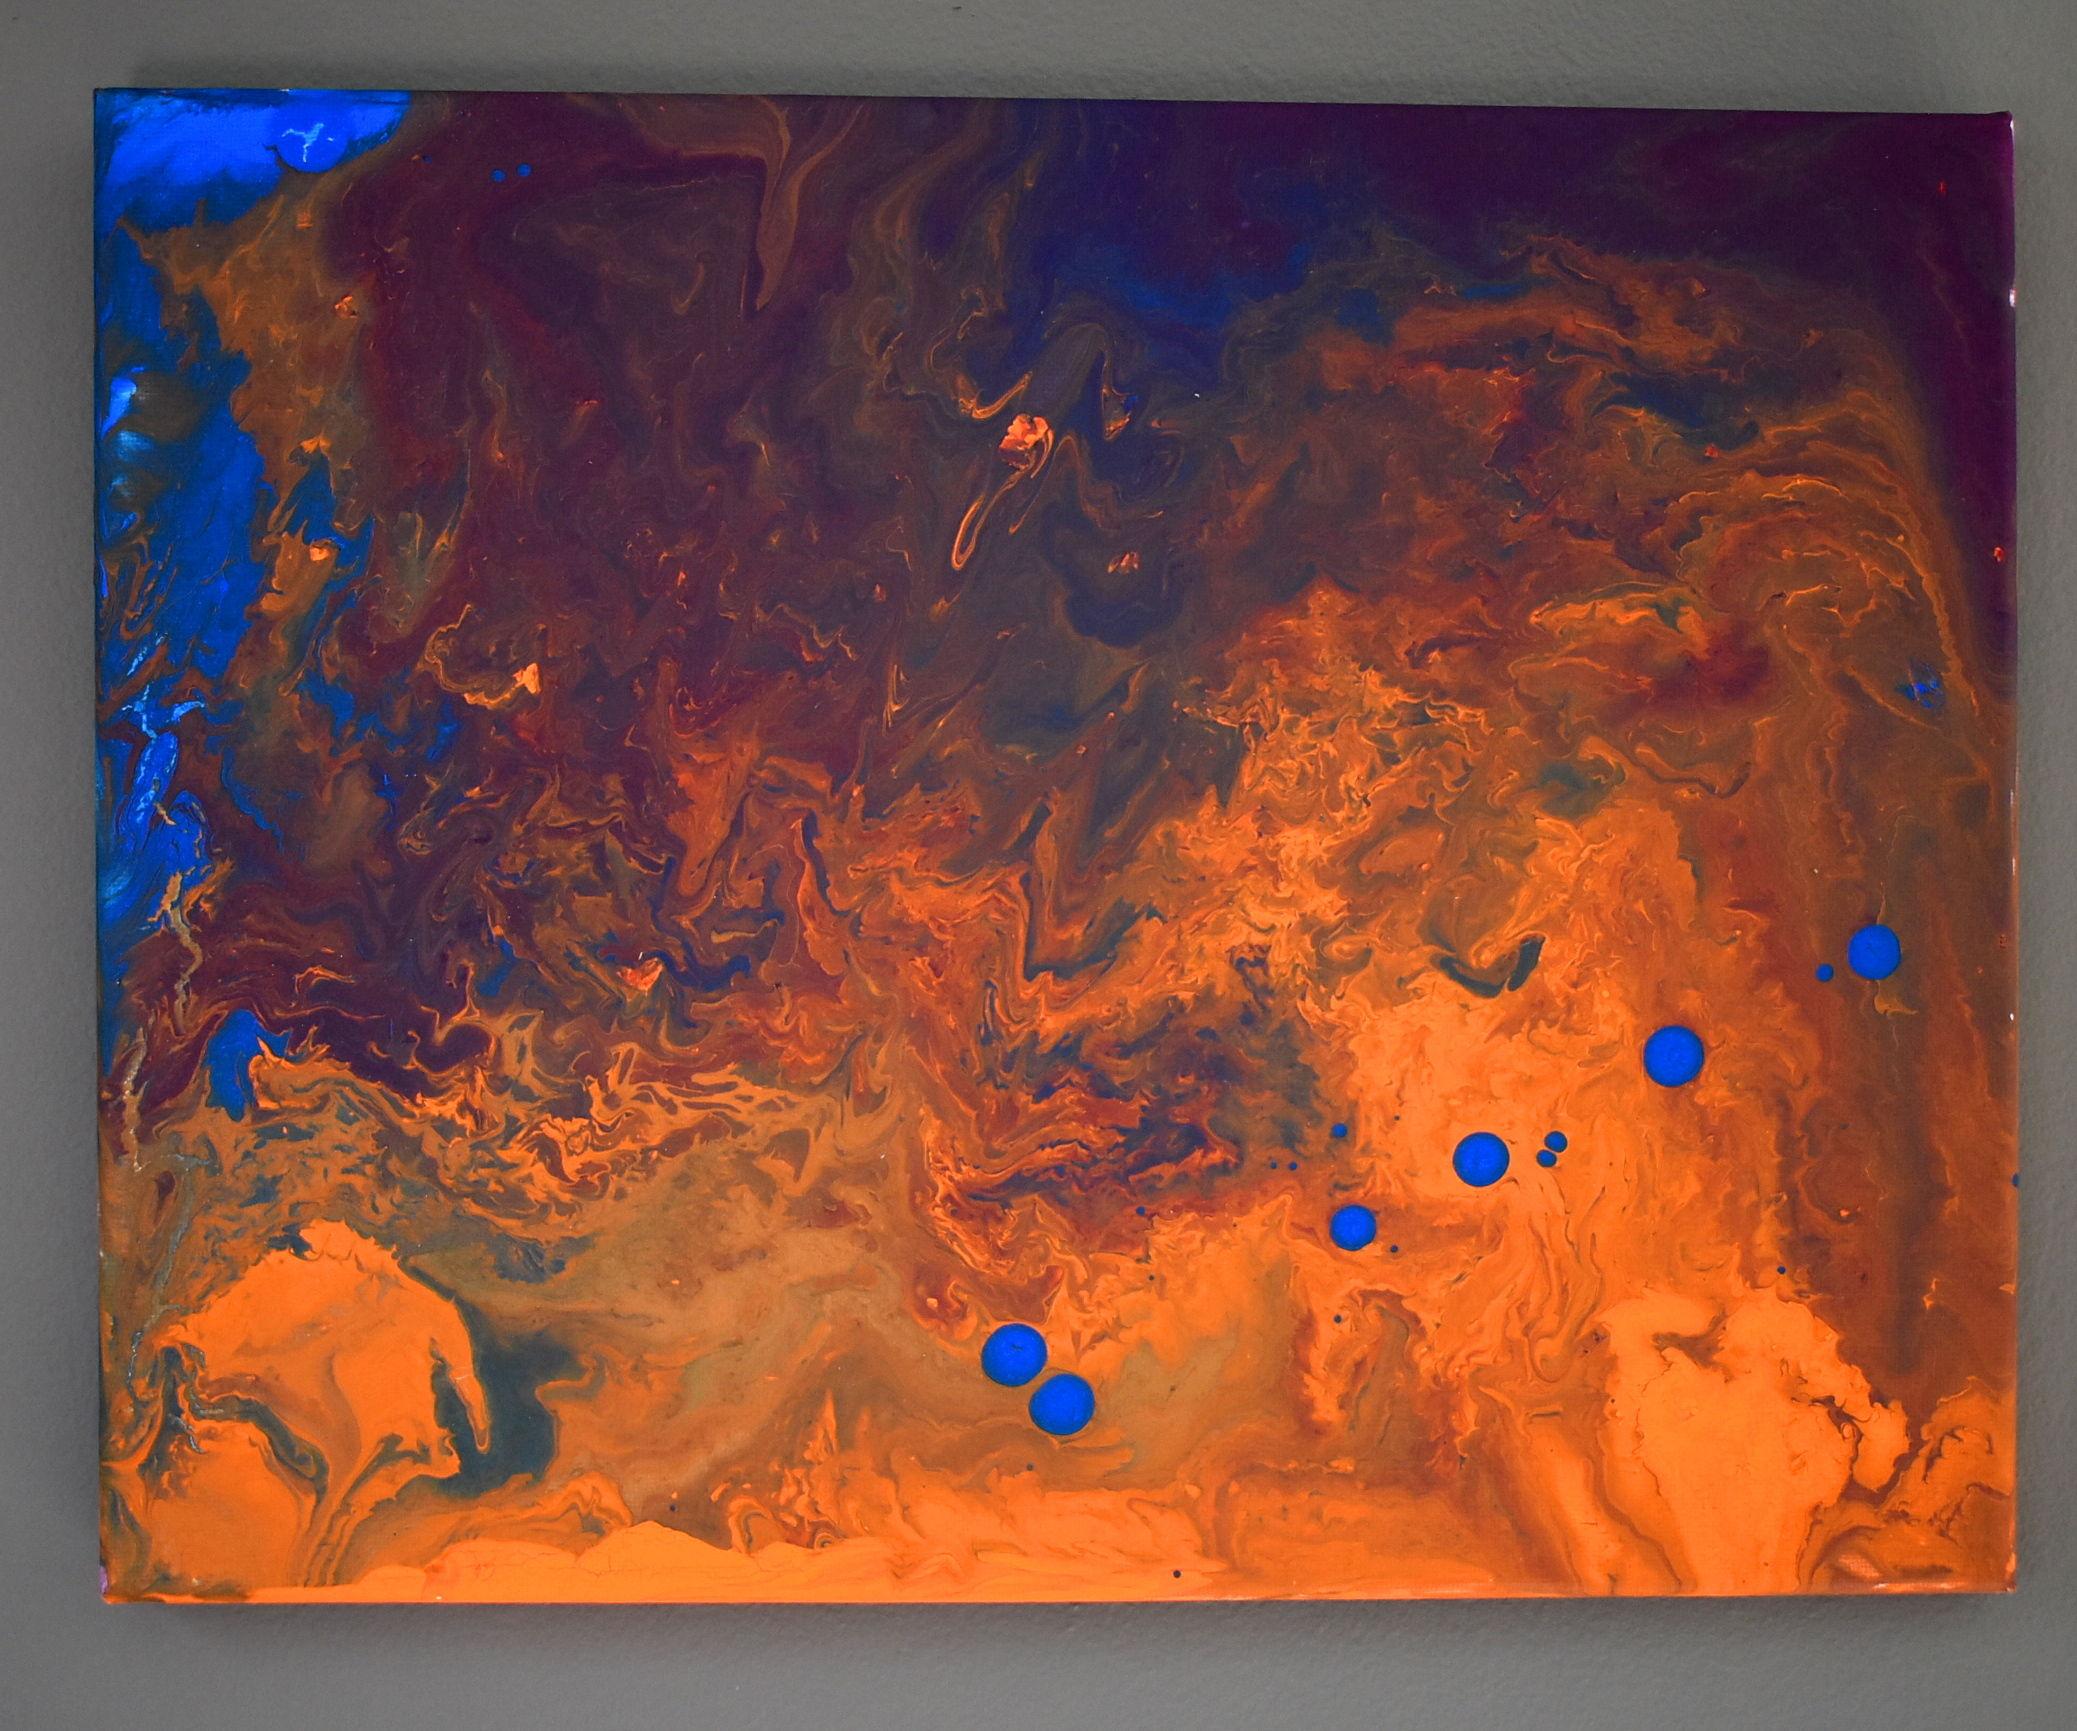 Dirty Flow Painting - Acrylic Magic!